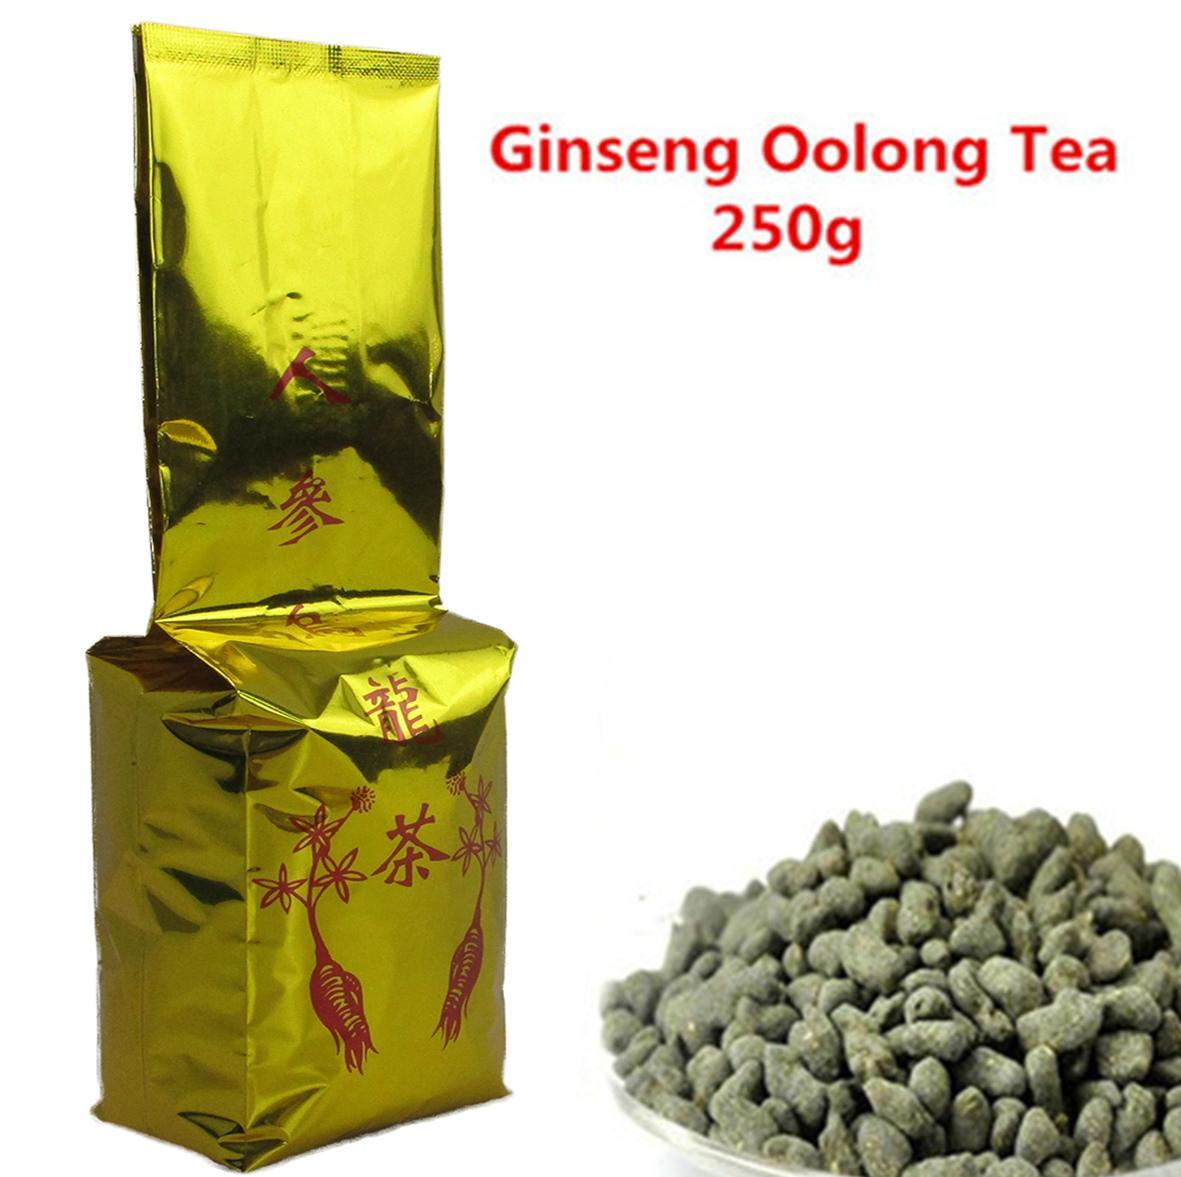 250g Chinois Organic Tea Oolong Top Greal Ginseng Oolong Beauté naturelle Thé vert Nouveau Spring Thé Vert Food préféré